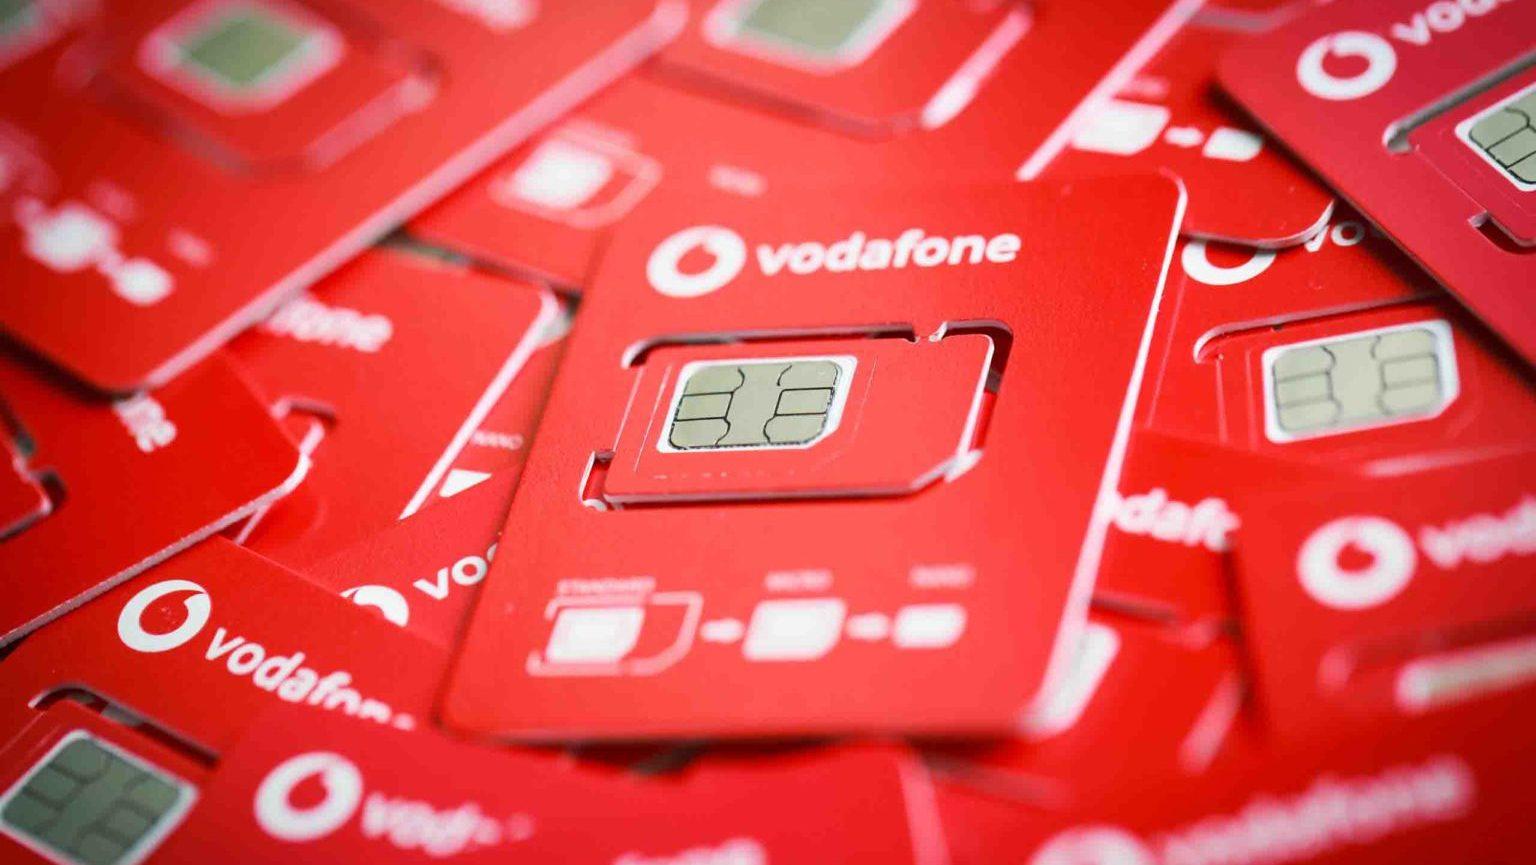 Vodafone sim 2 scaled 1